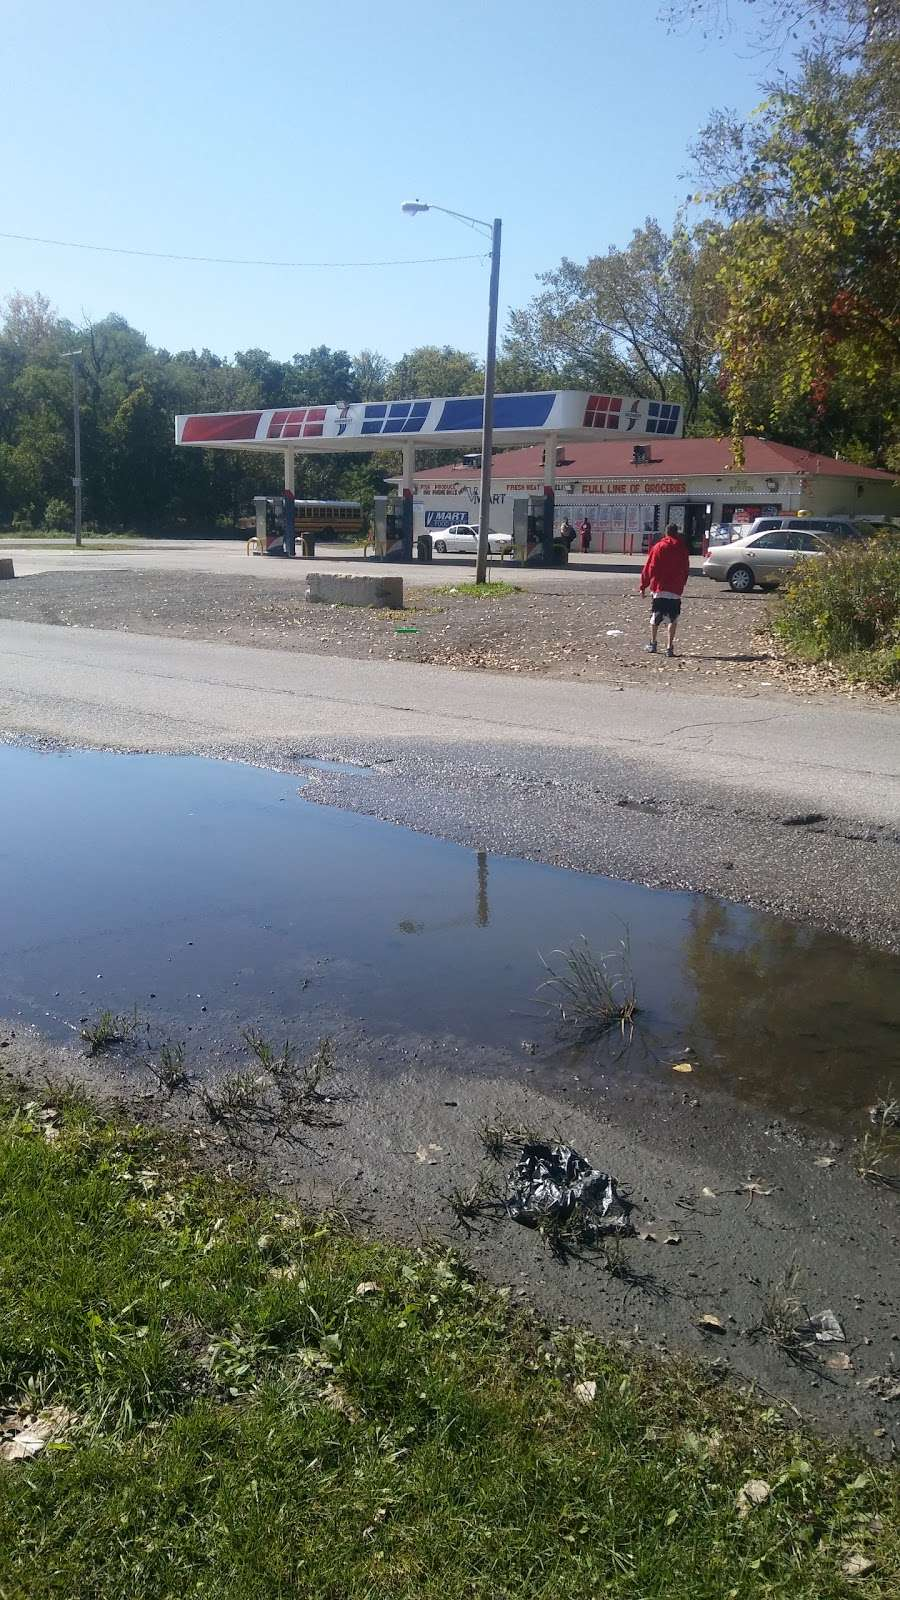 Citgo - gas station  | Photo 2 of 3 | Address: 2490 Clark Rd, Gary, IN 46404, USA | Phone: (219) 977-1726